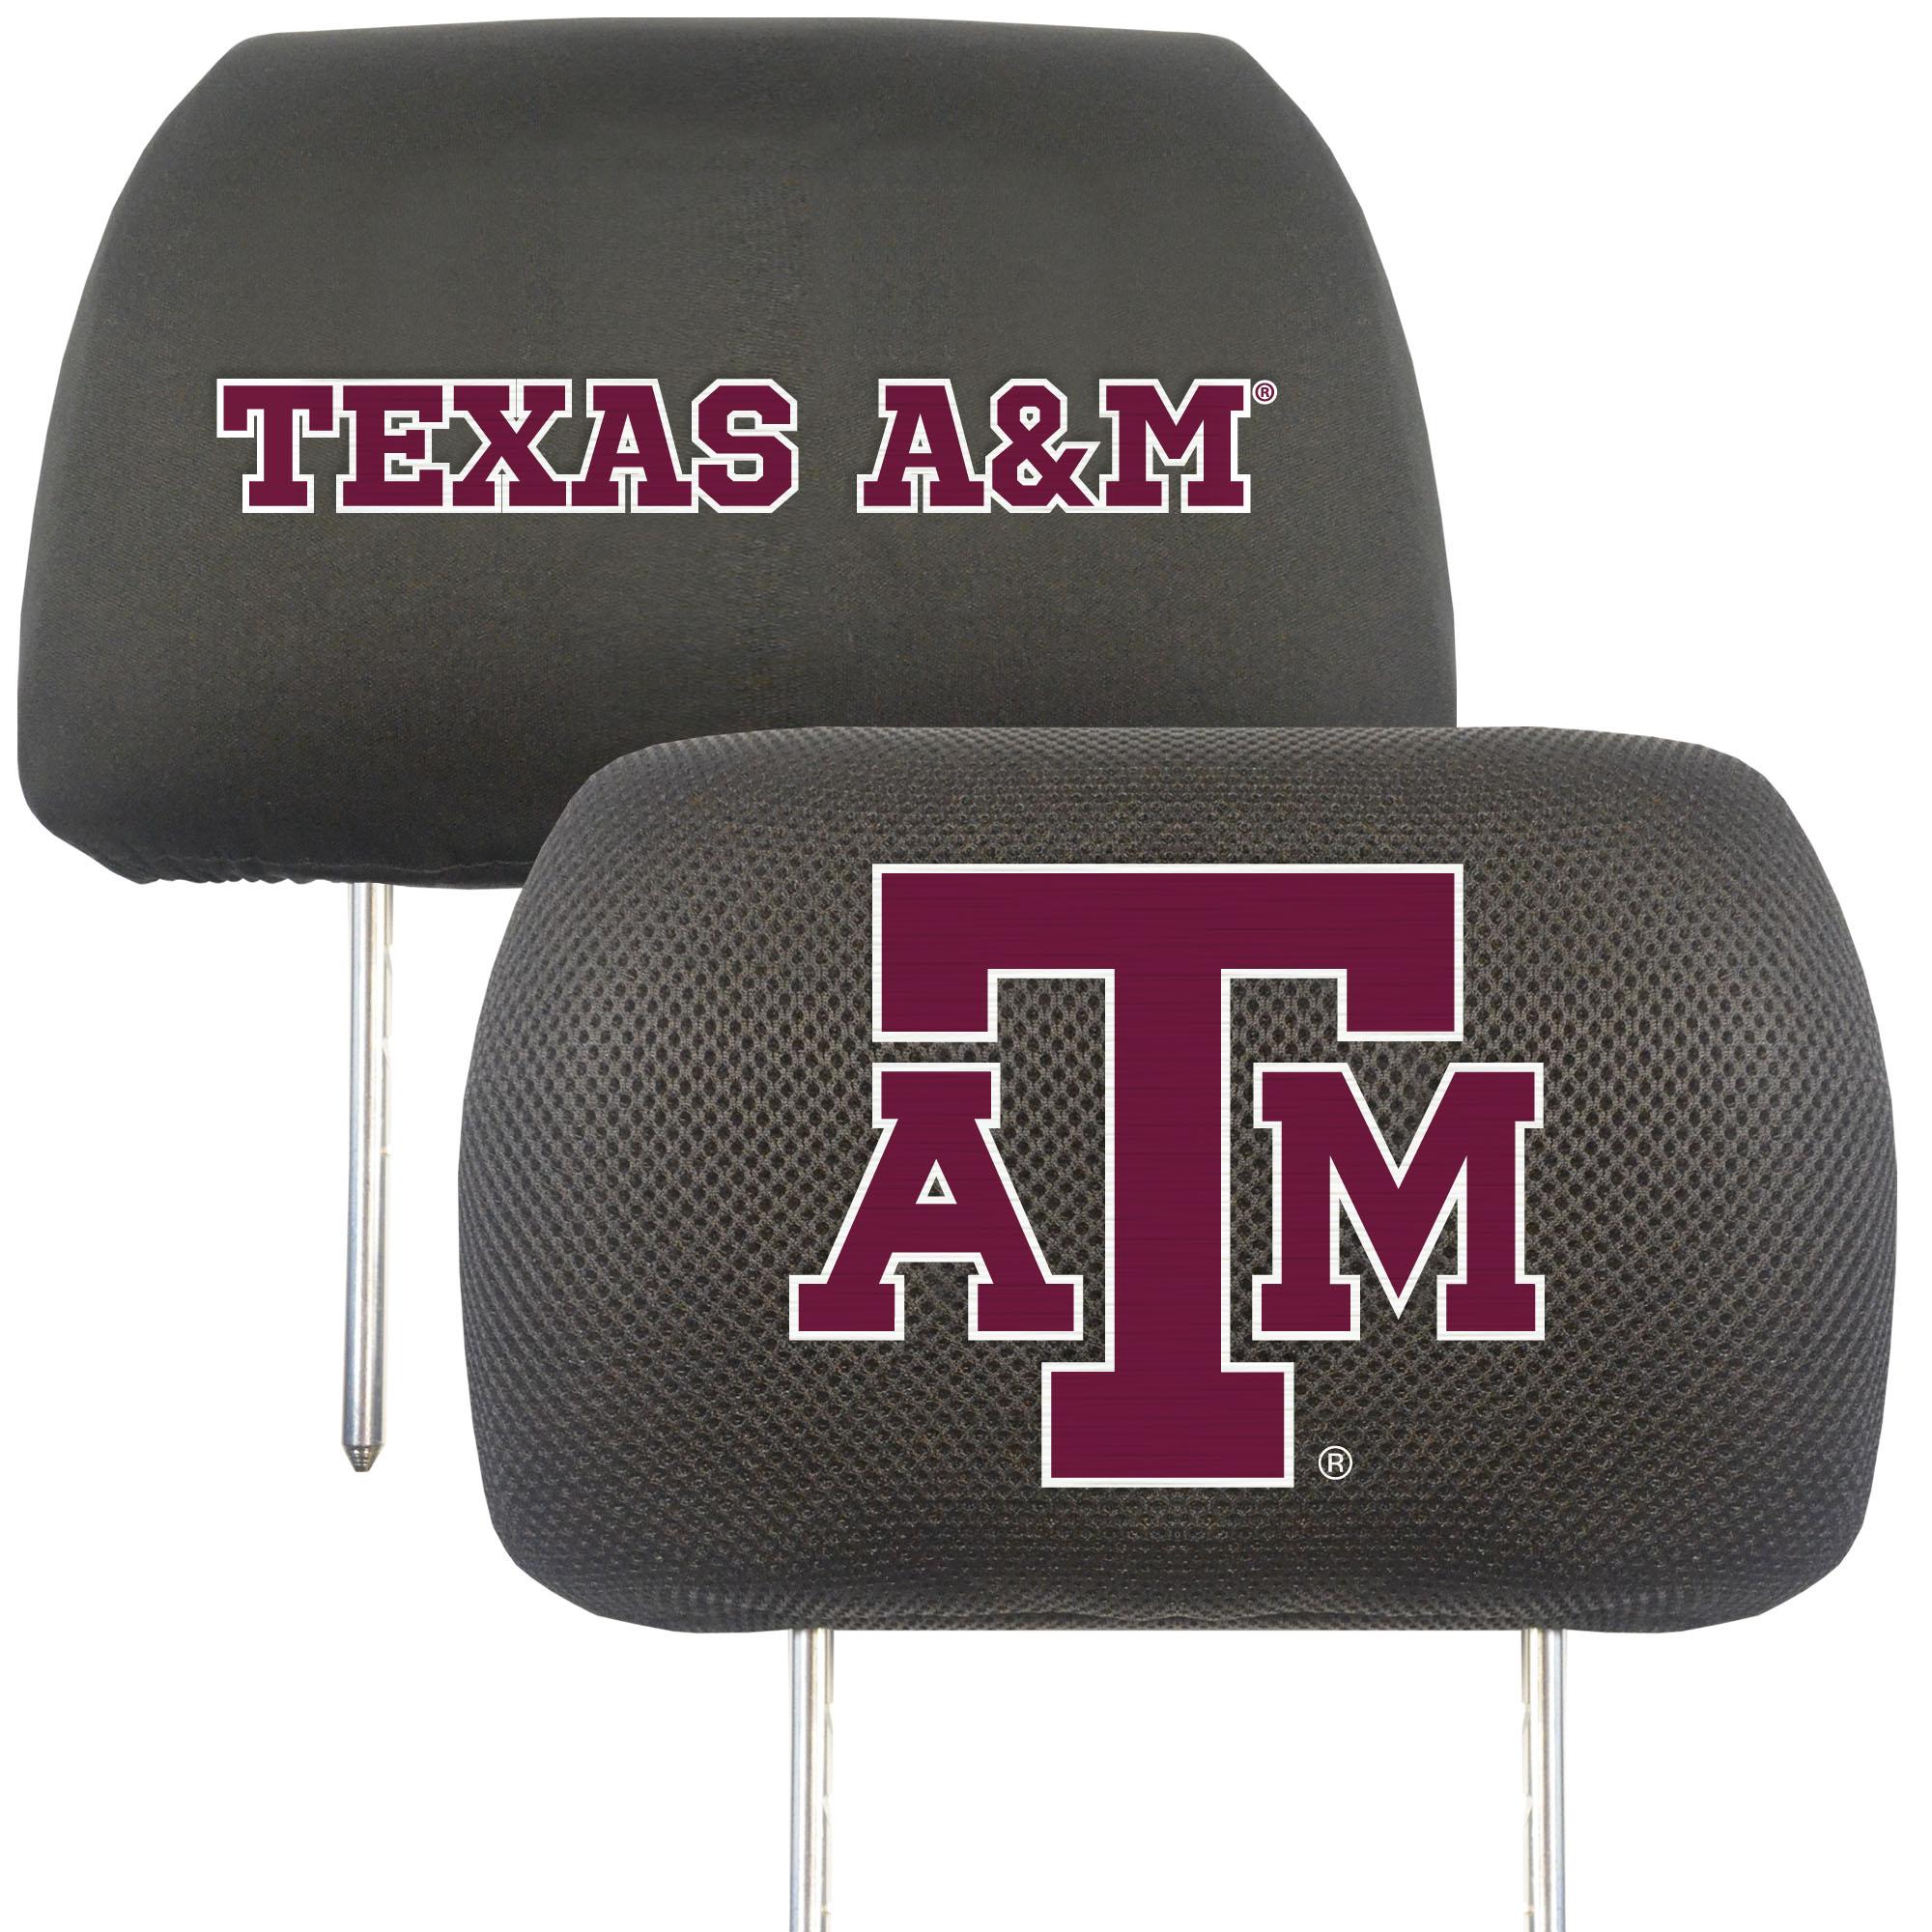 NCAA Texas A&M University Aggies Head Rest Cover Automotive Accessory